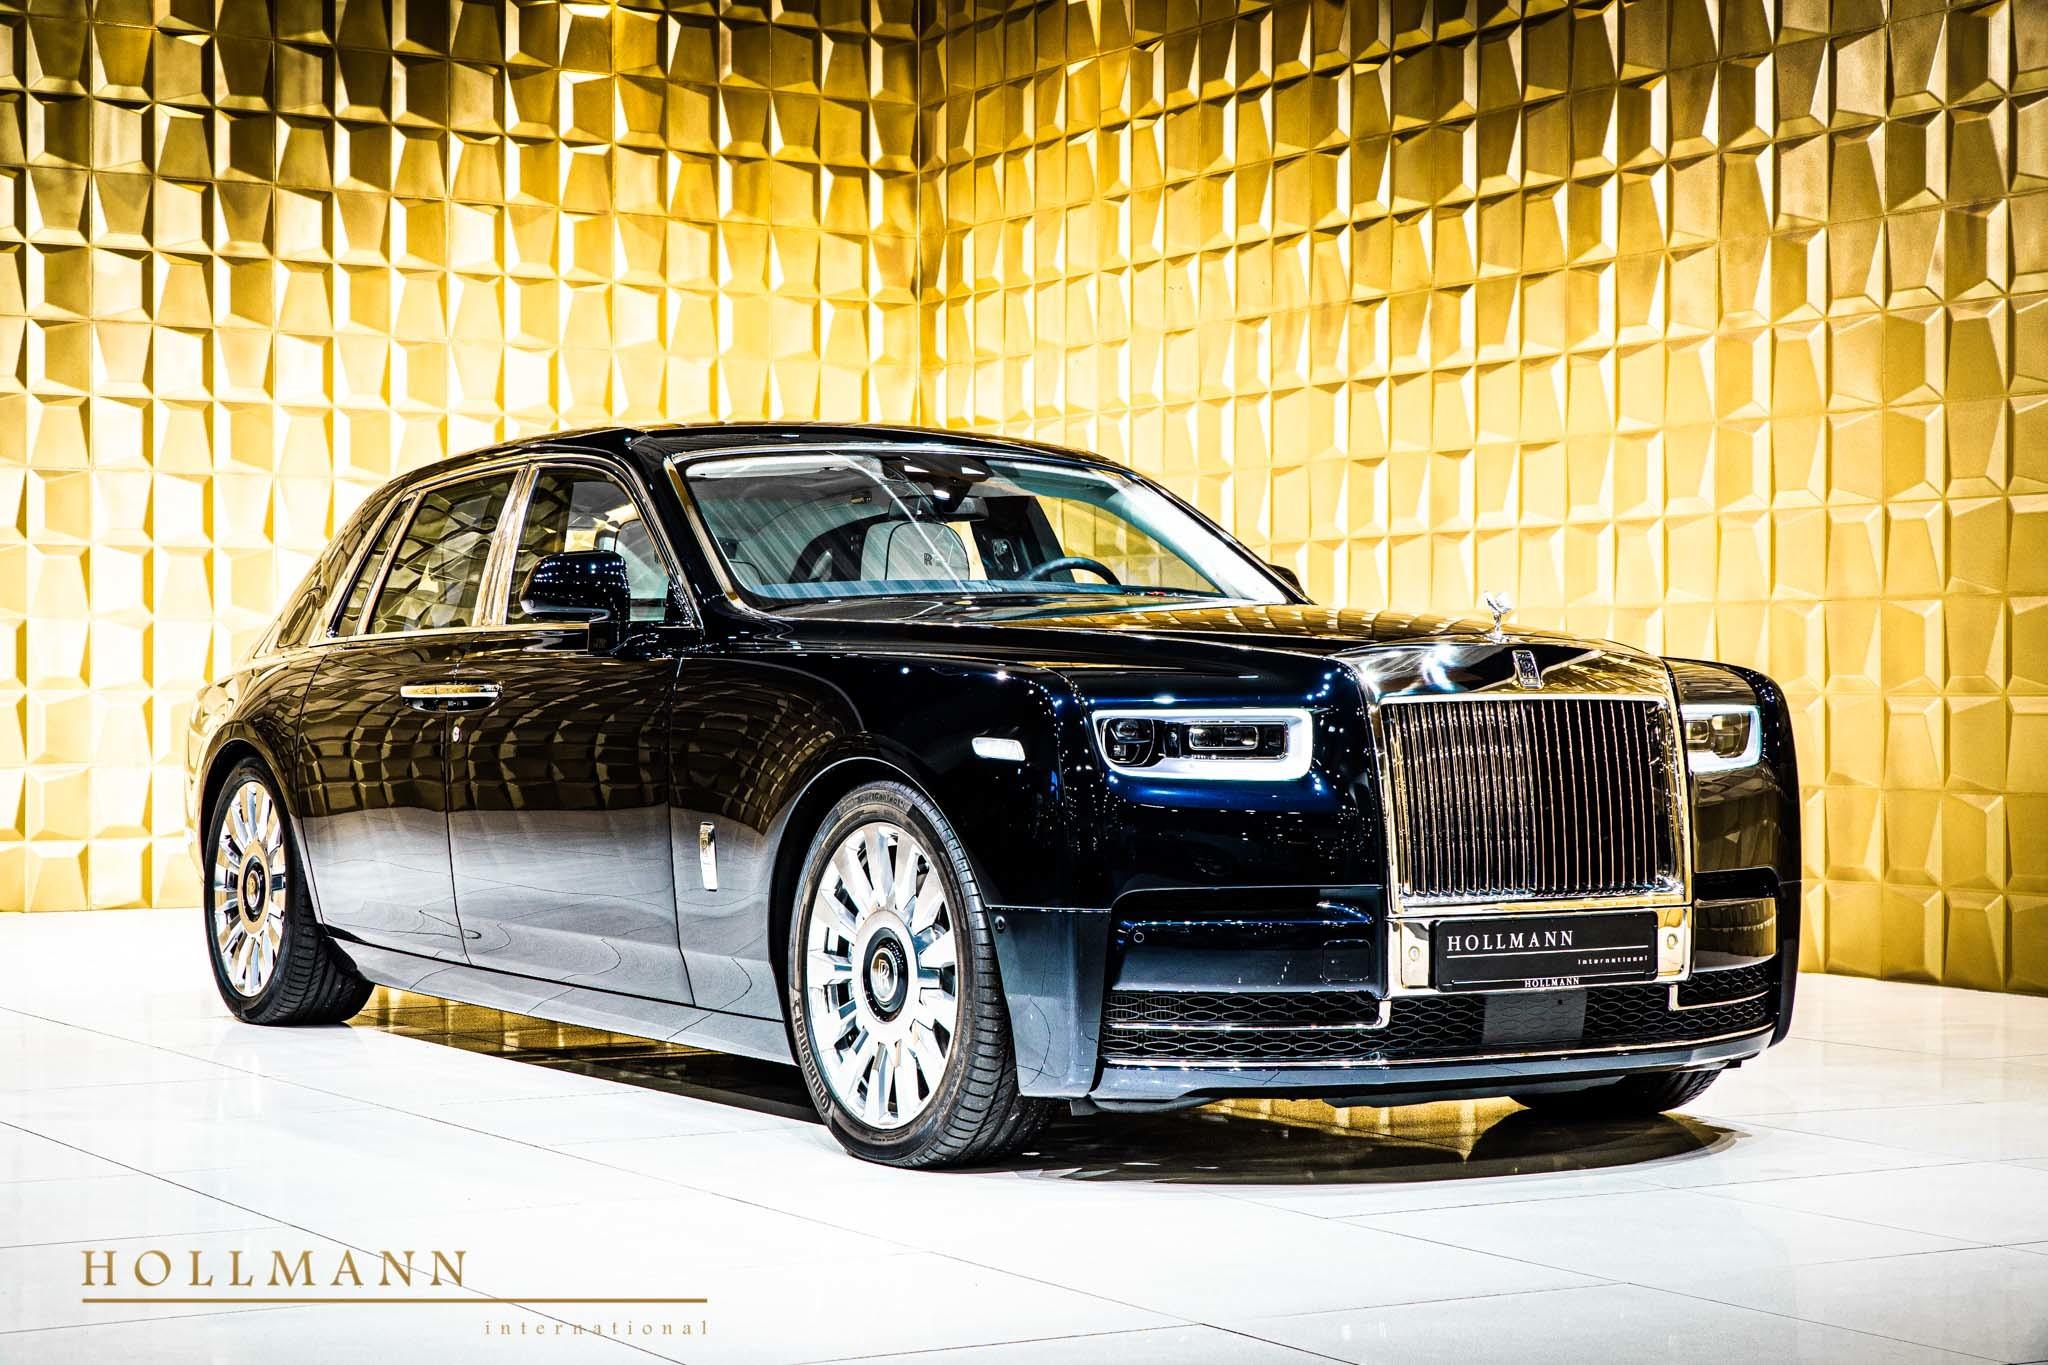 For sale : Rolls-Royce Phantom VIII - Hollmann ...